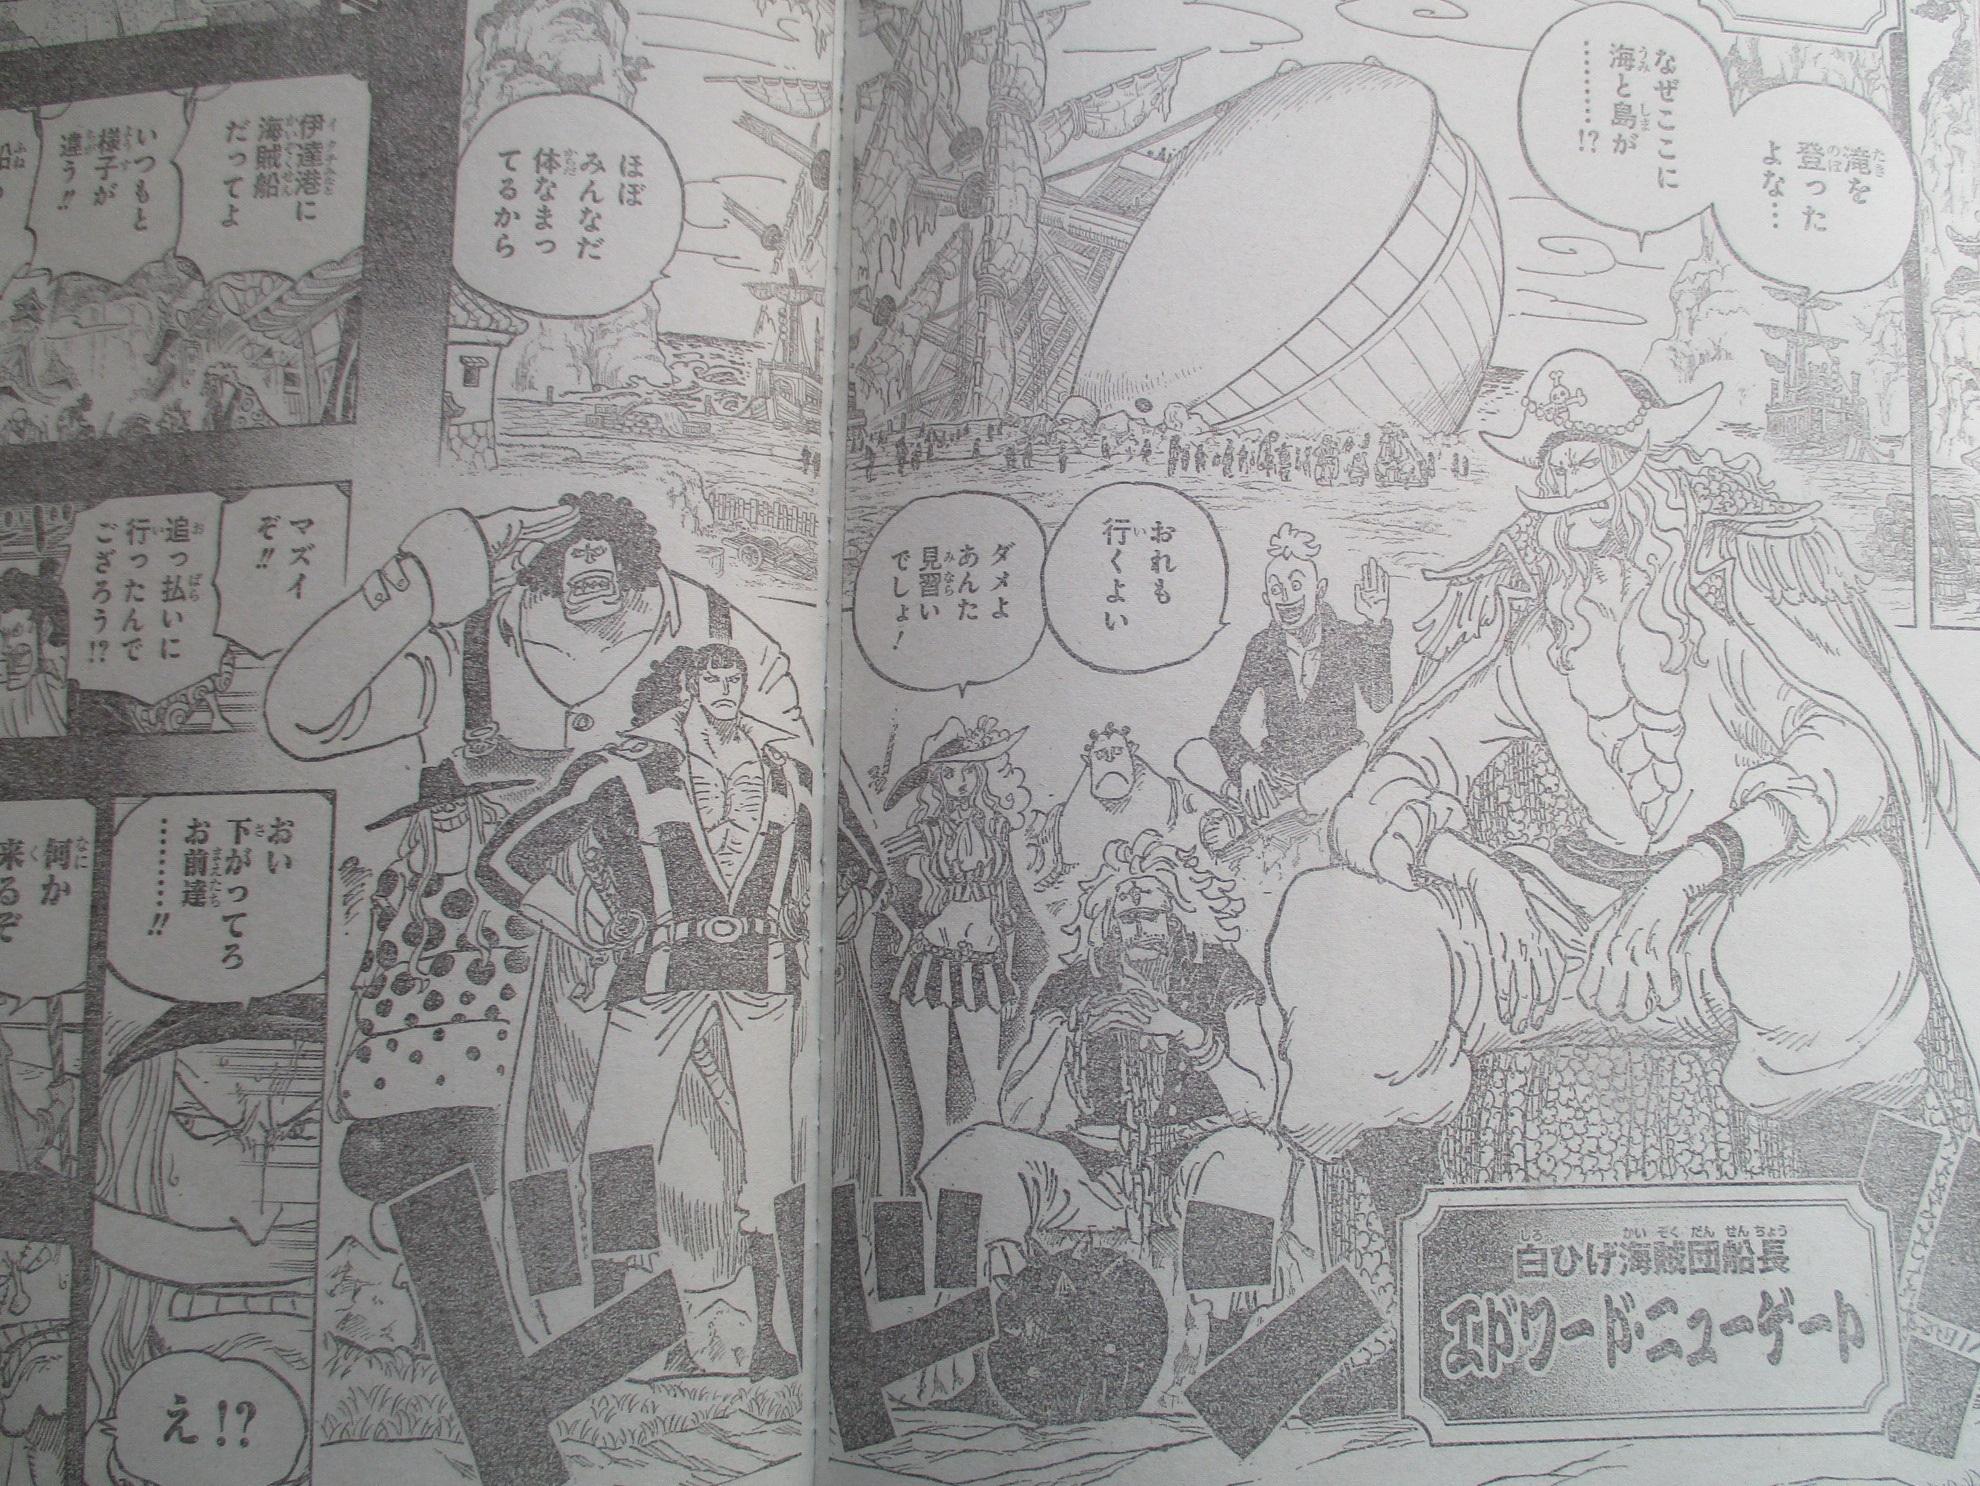 One Piece Manga Chapter 963 Spoilers